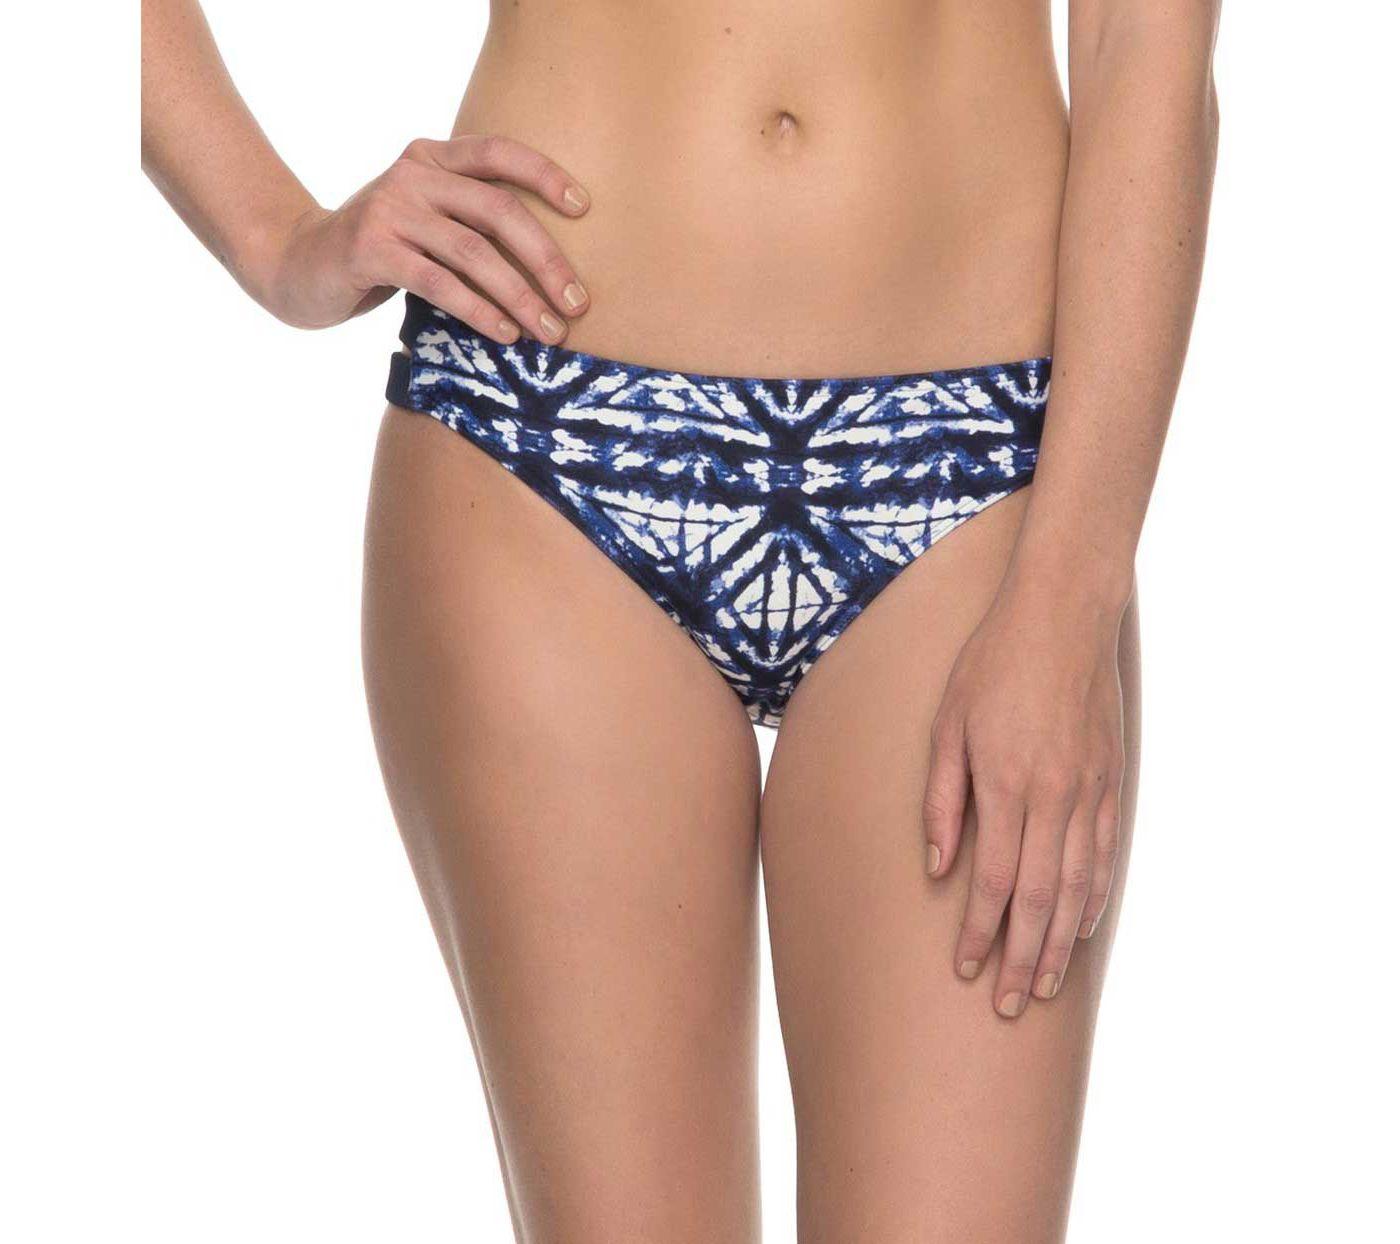 Roxy Women's Fitness 70s Bikini Bottoms